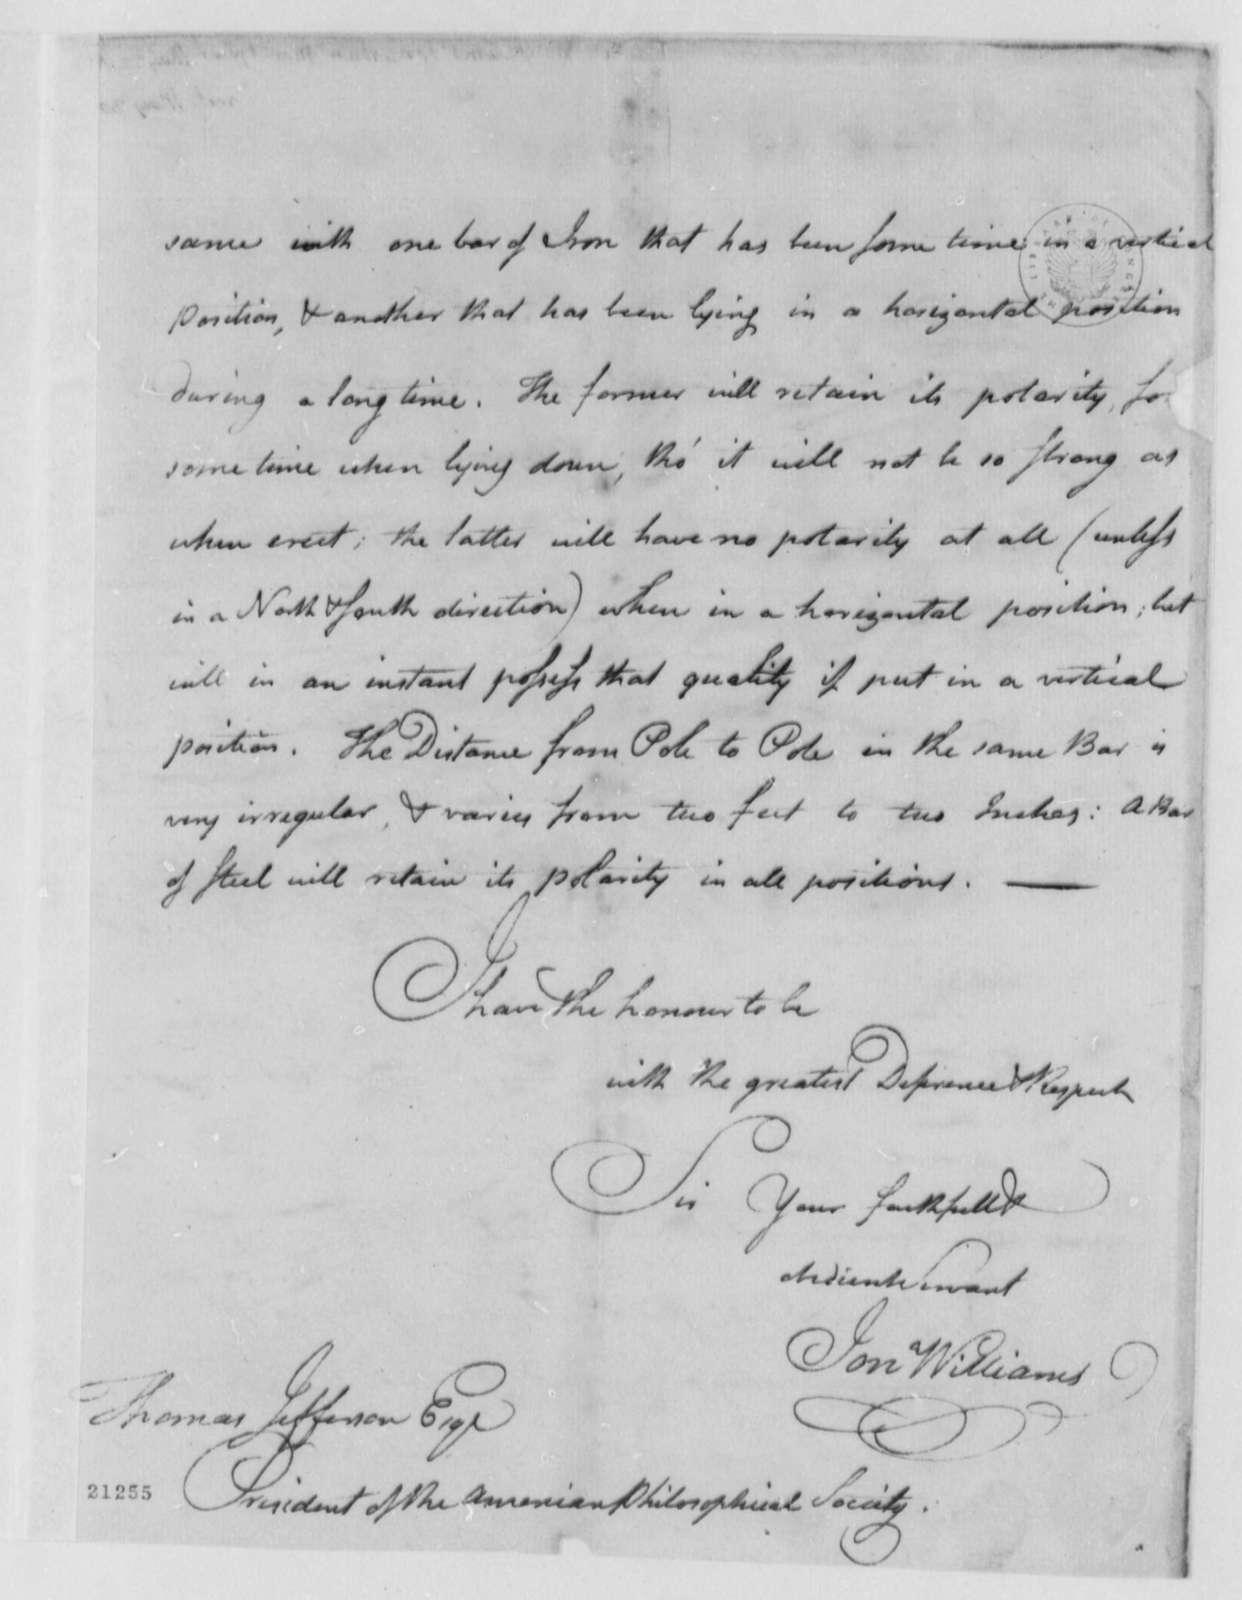 Jonathan Williams to Thomas Jefferson, May 22, 1802